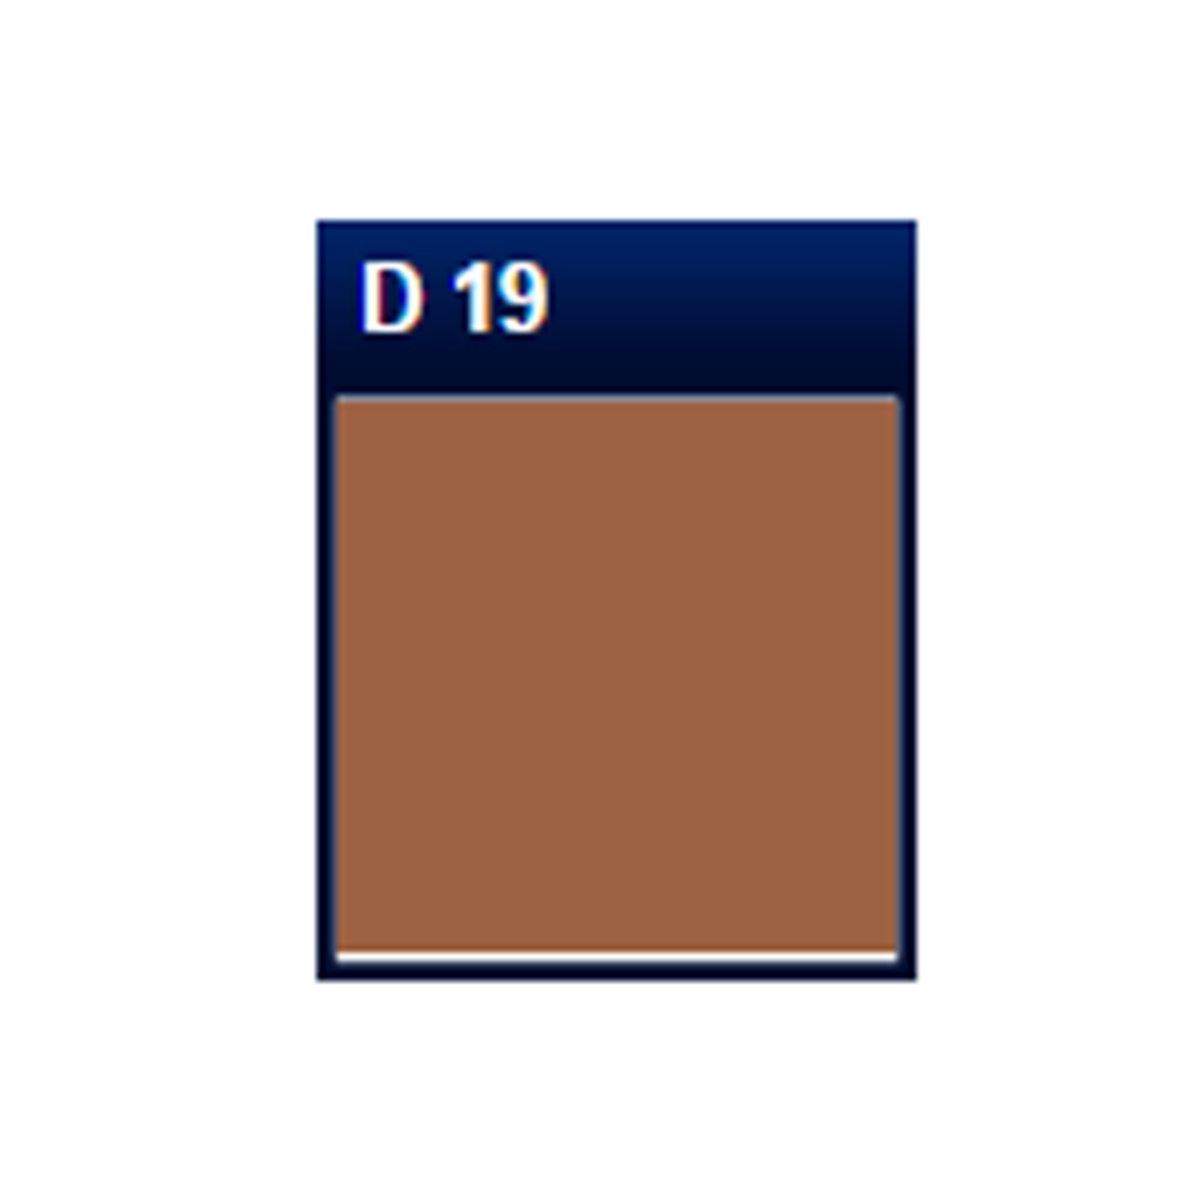 Derma Color Camouflage Fluid 30ml #D19 - (Authorised Goods)